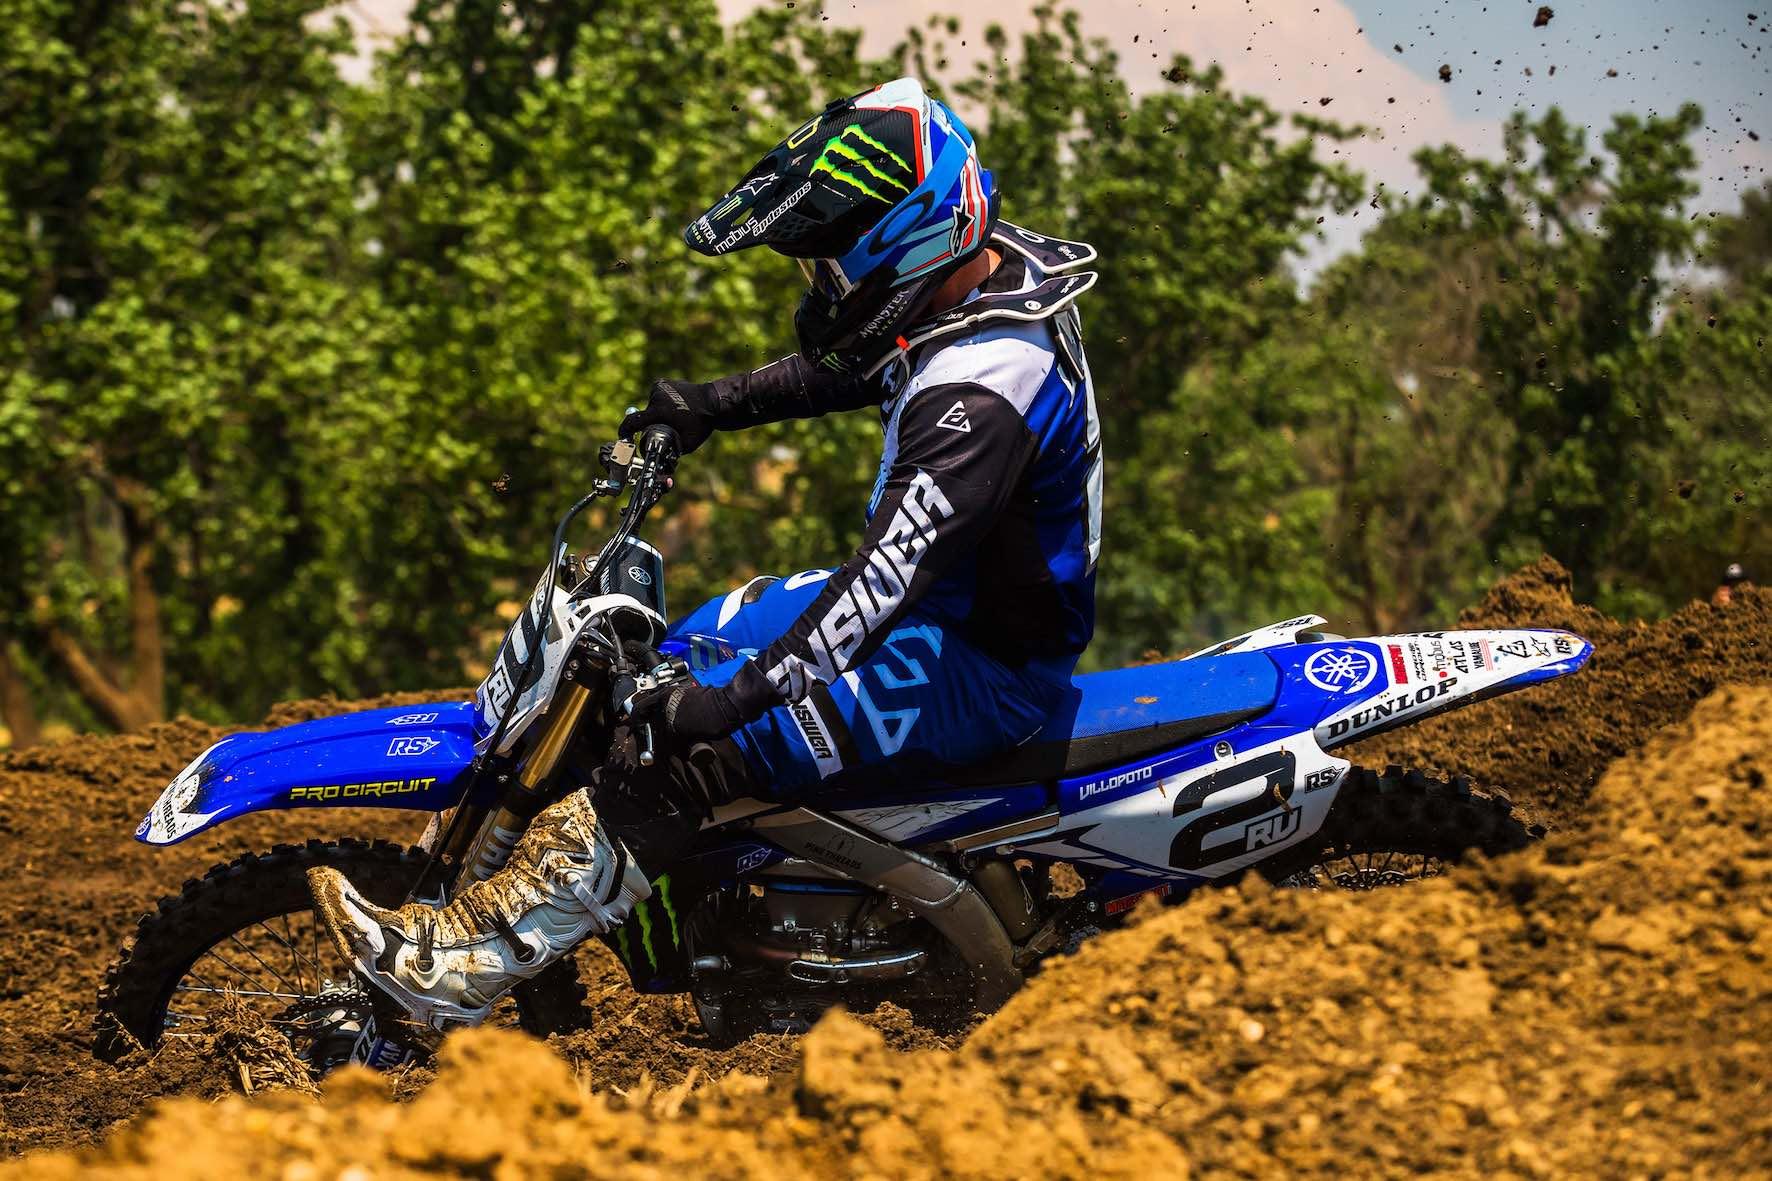 We interview motocross pro, Ryan Villopoto